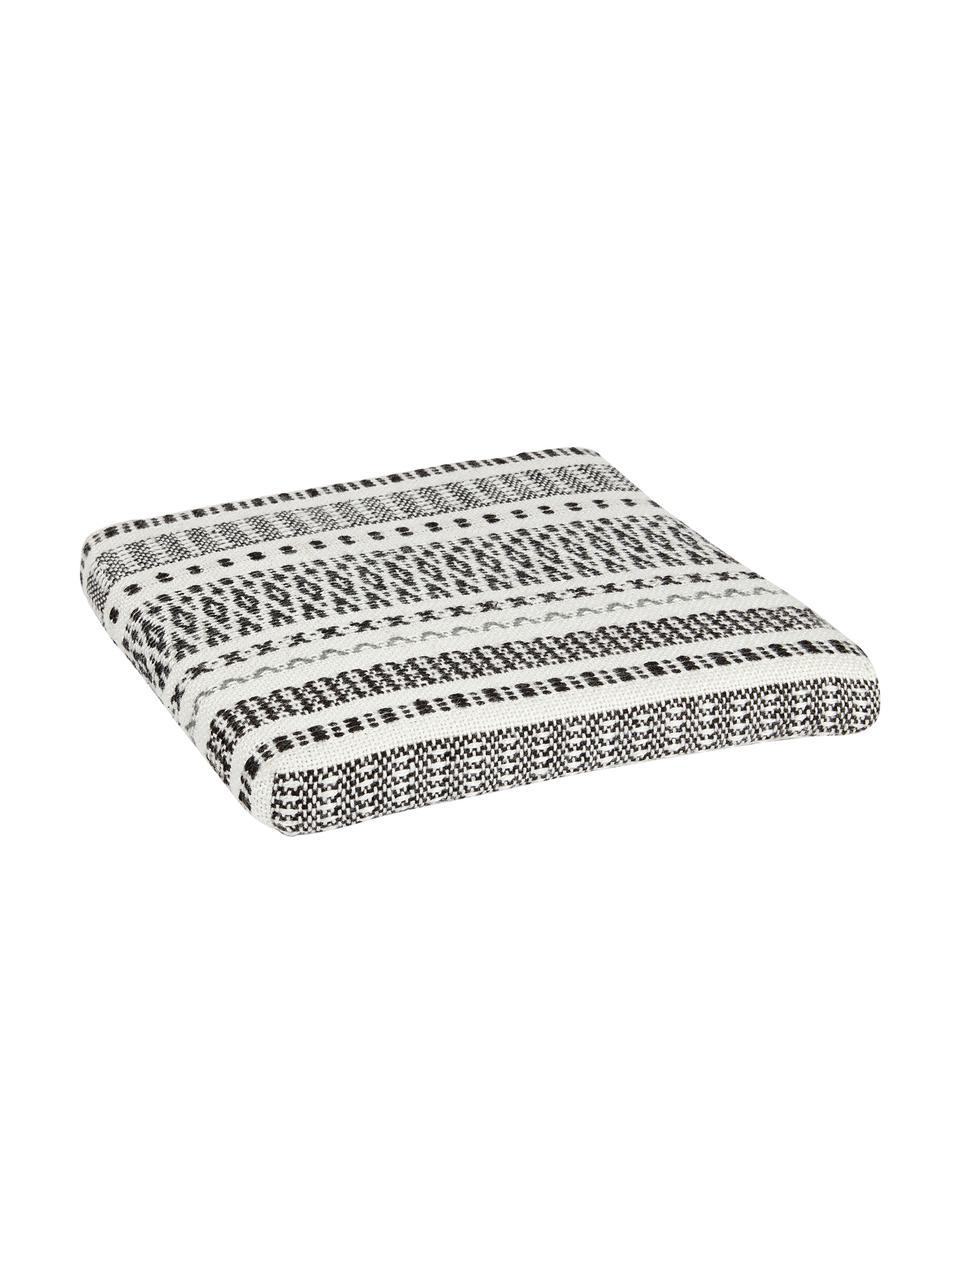 Gemustertes Sitzkissen Faroe aus recyceltem PET, PET, recycelt, Weiß, Schwarz, 40 x 40 cm